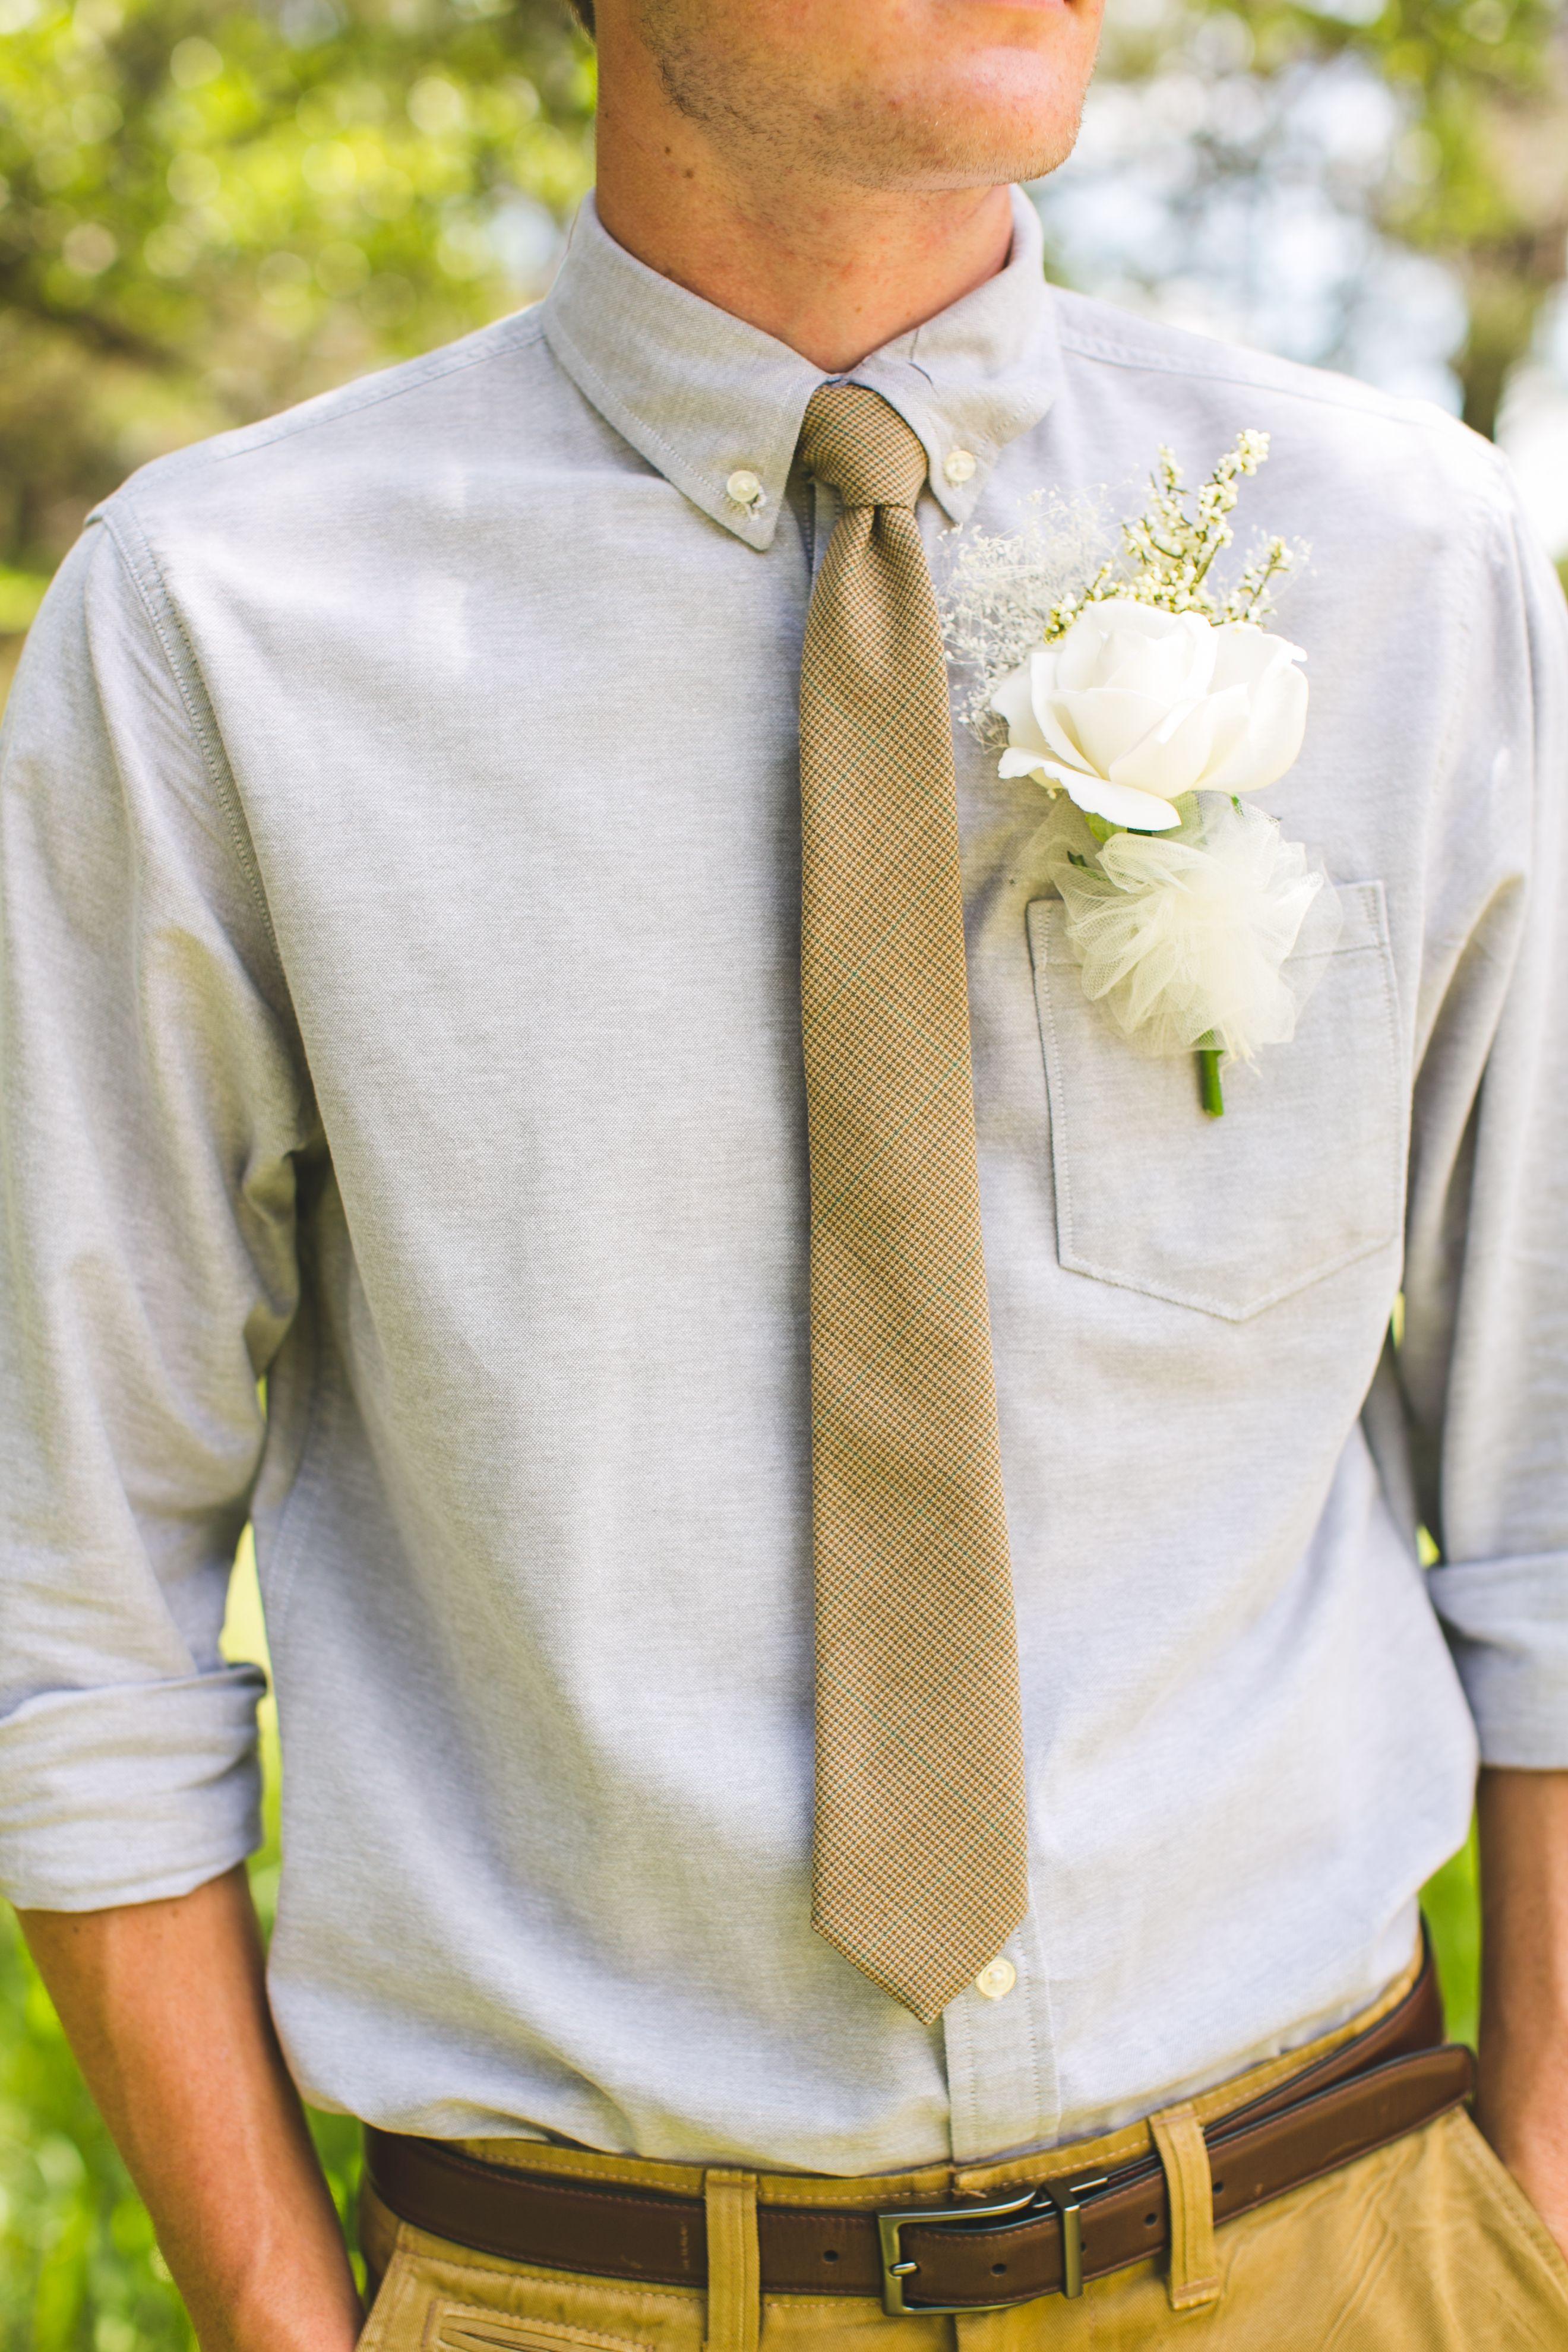 Casual men attire for outdoor wedding | West Texas Wedding ...